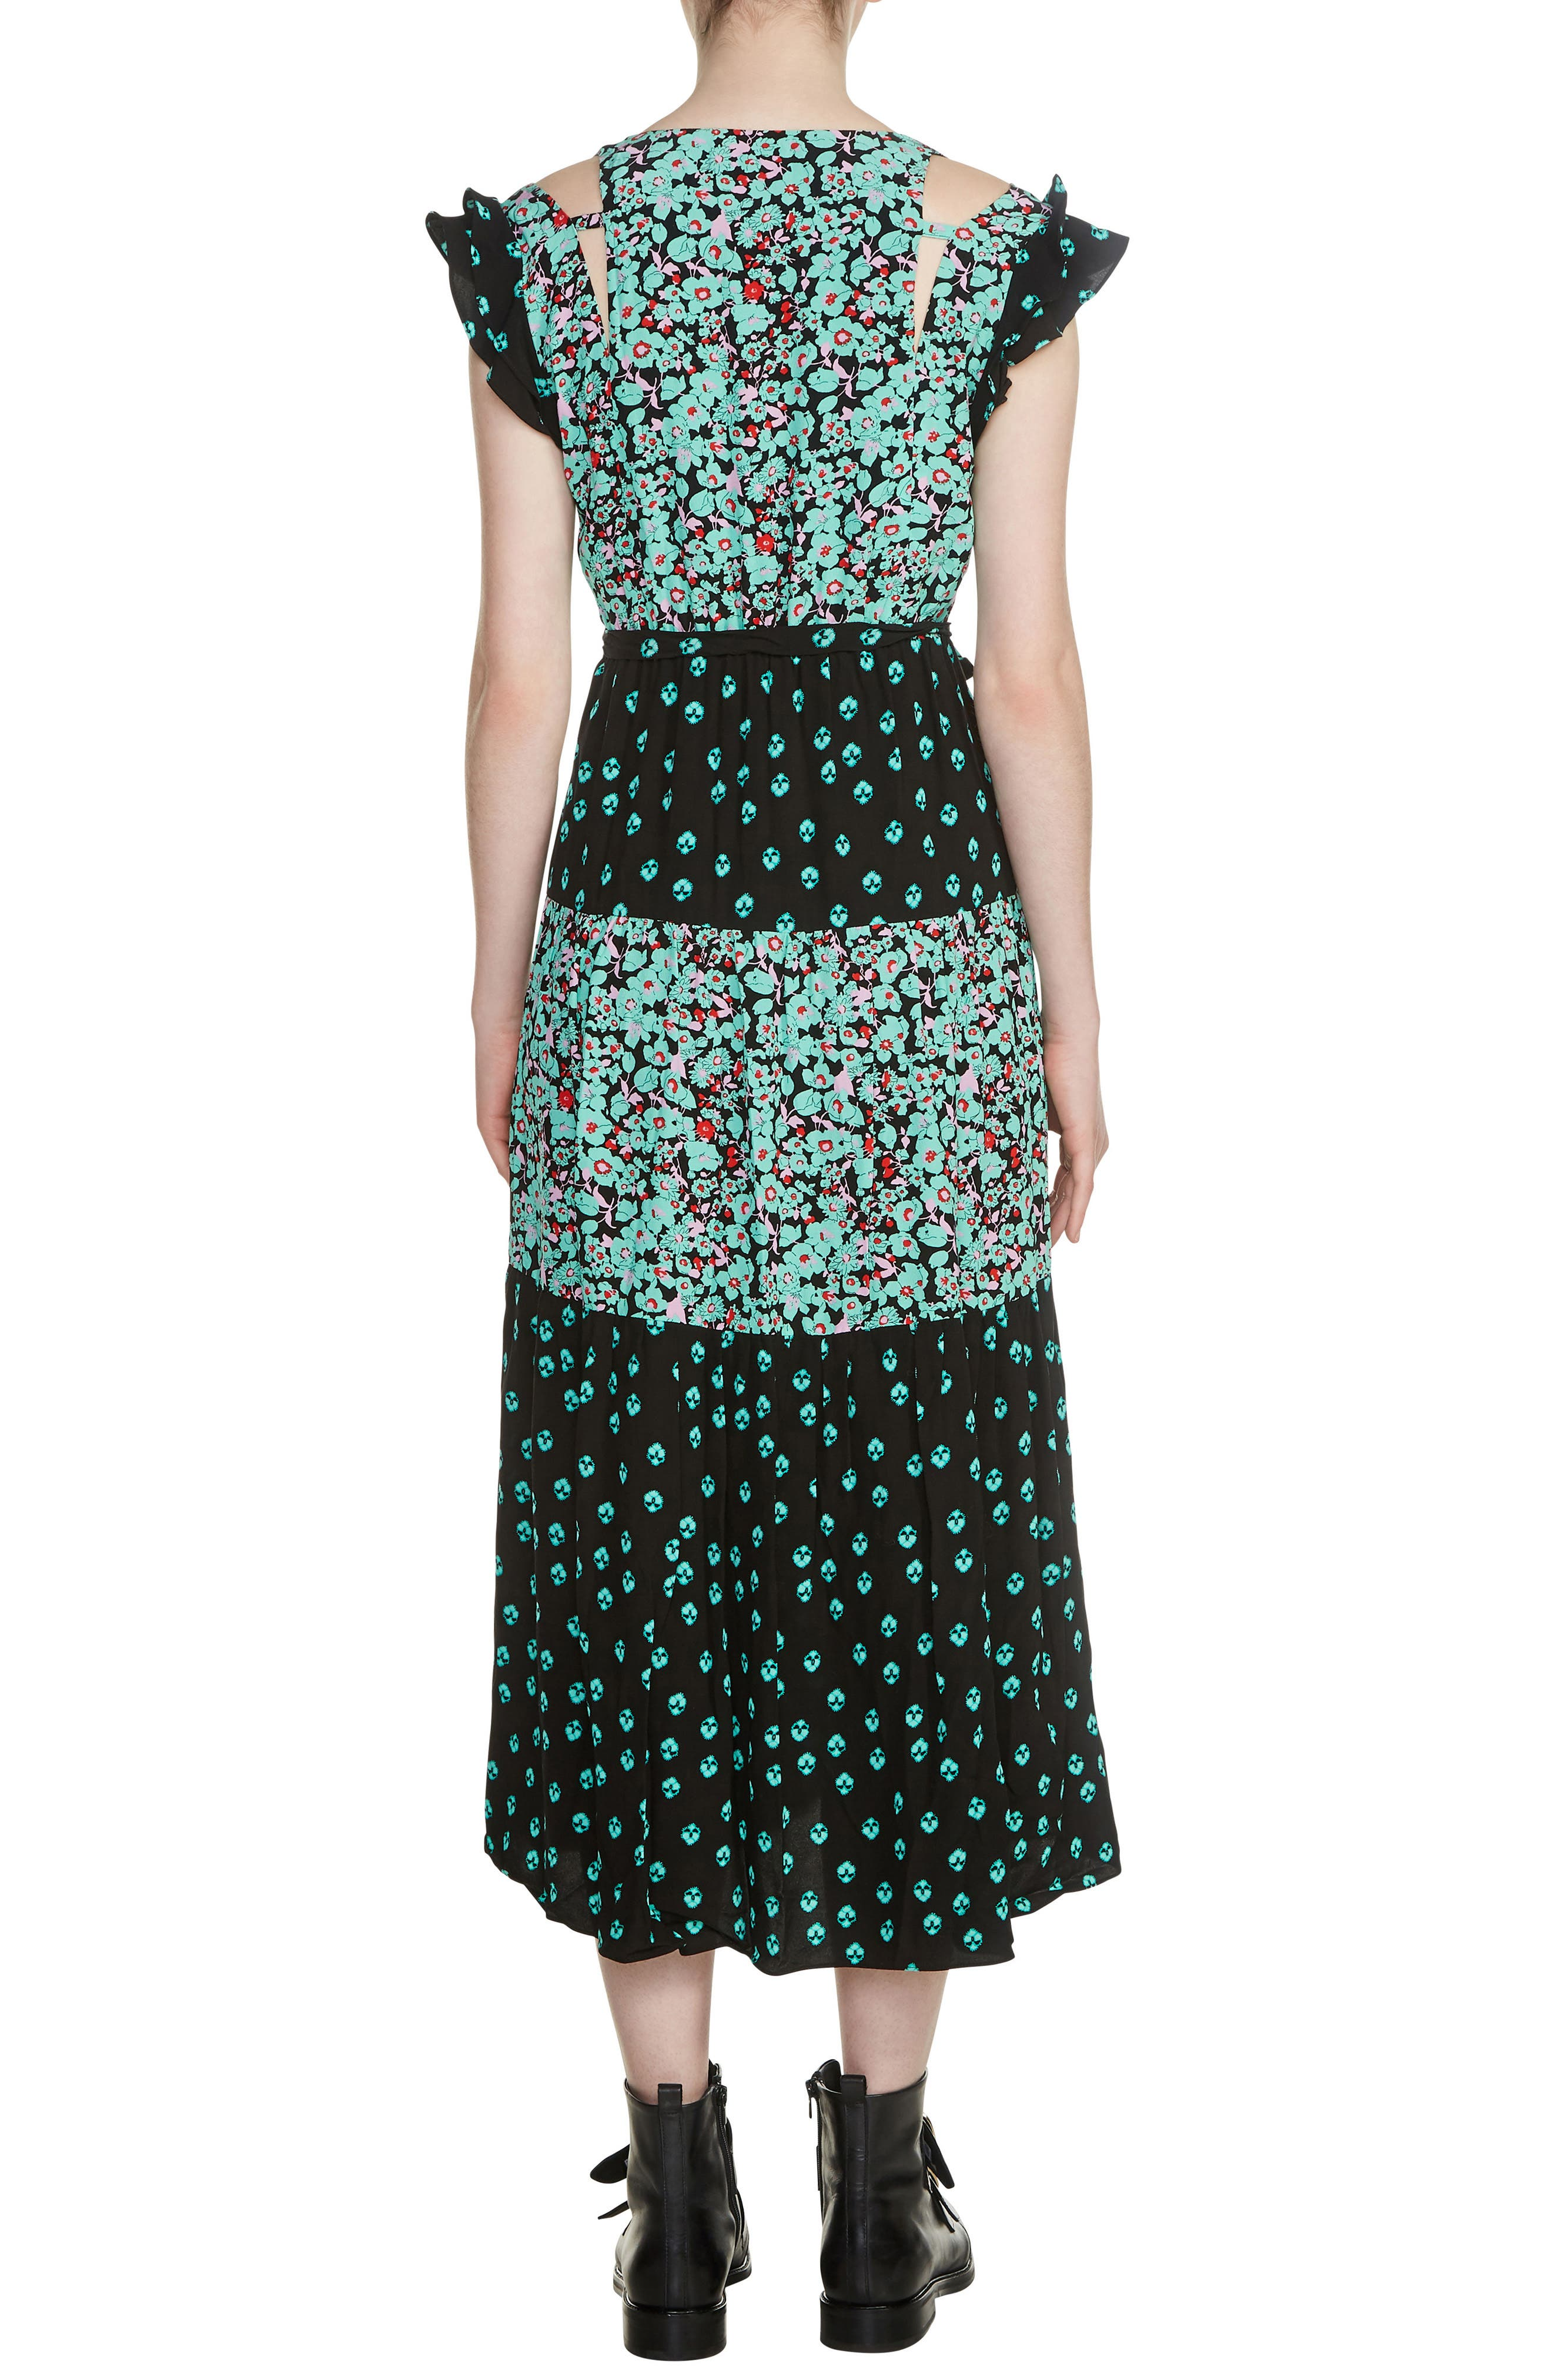 Renoli Mixed Print Midi Dress,                             Alternate thumbnail 2, color,                             Printed